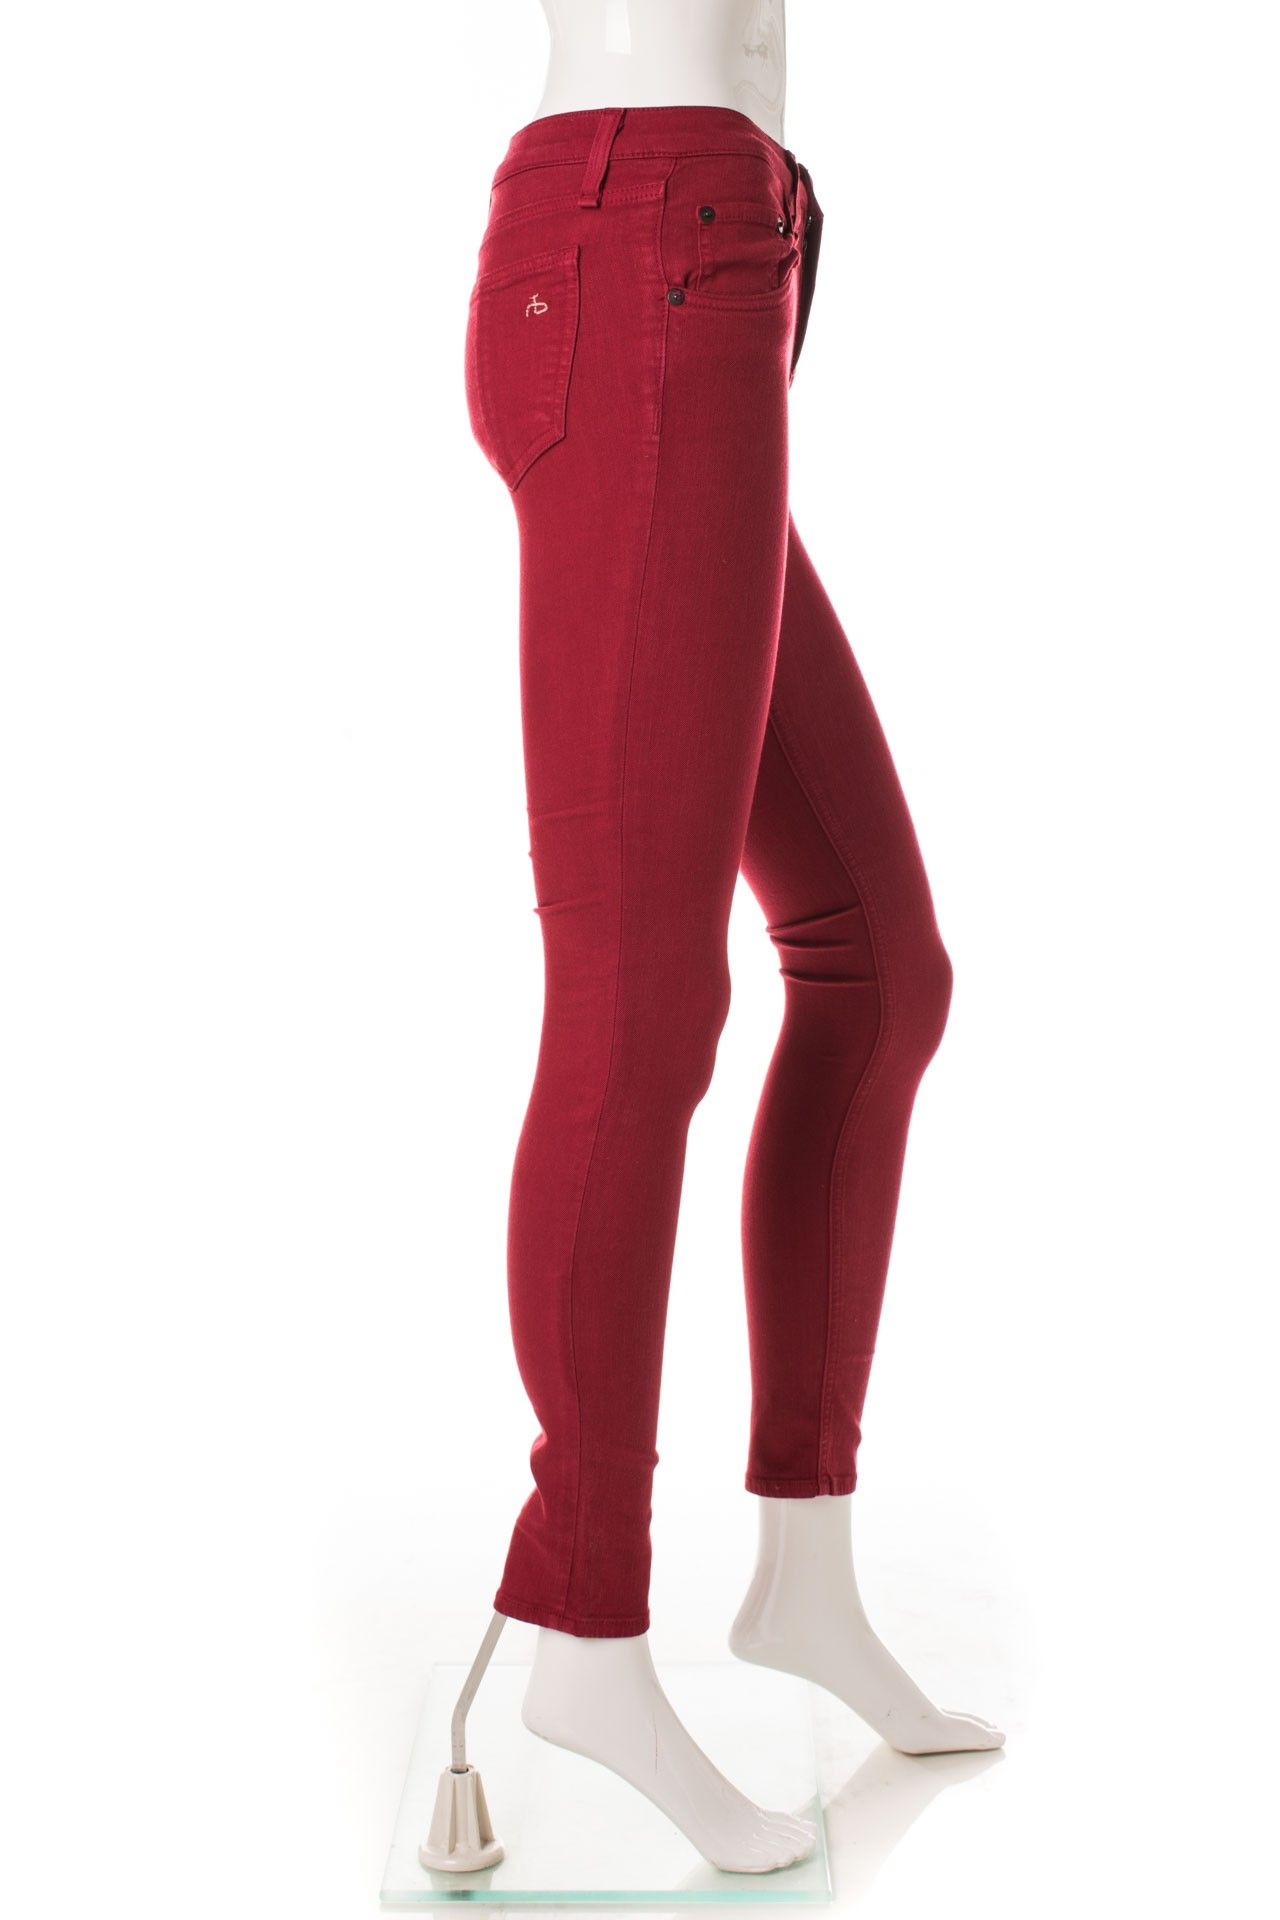 Rag & Bone - Calça Skinny Red - Foto 3